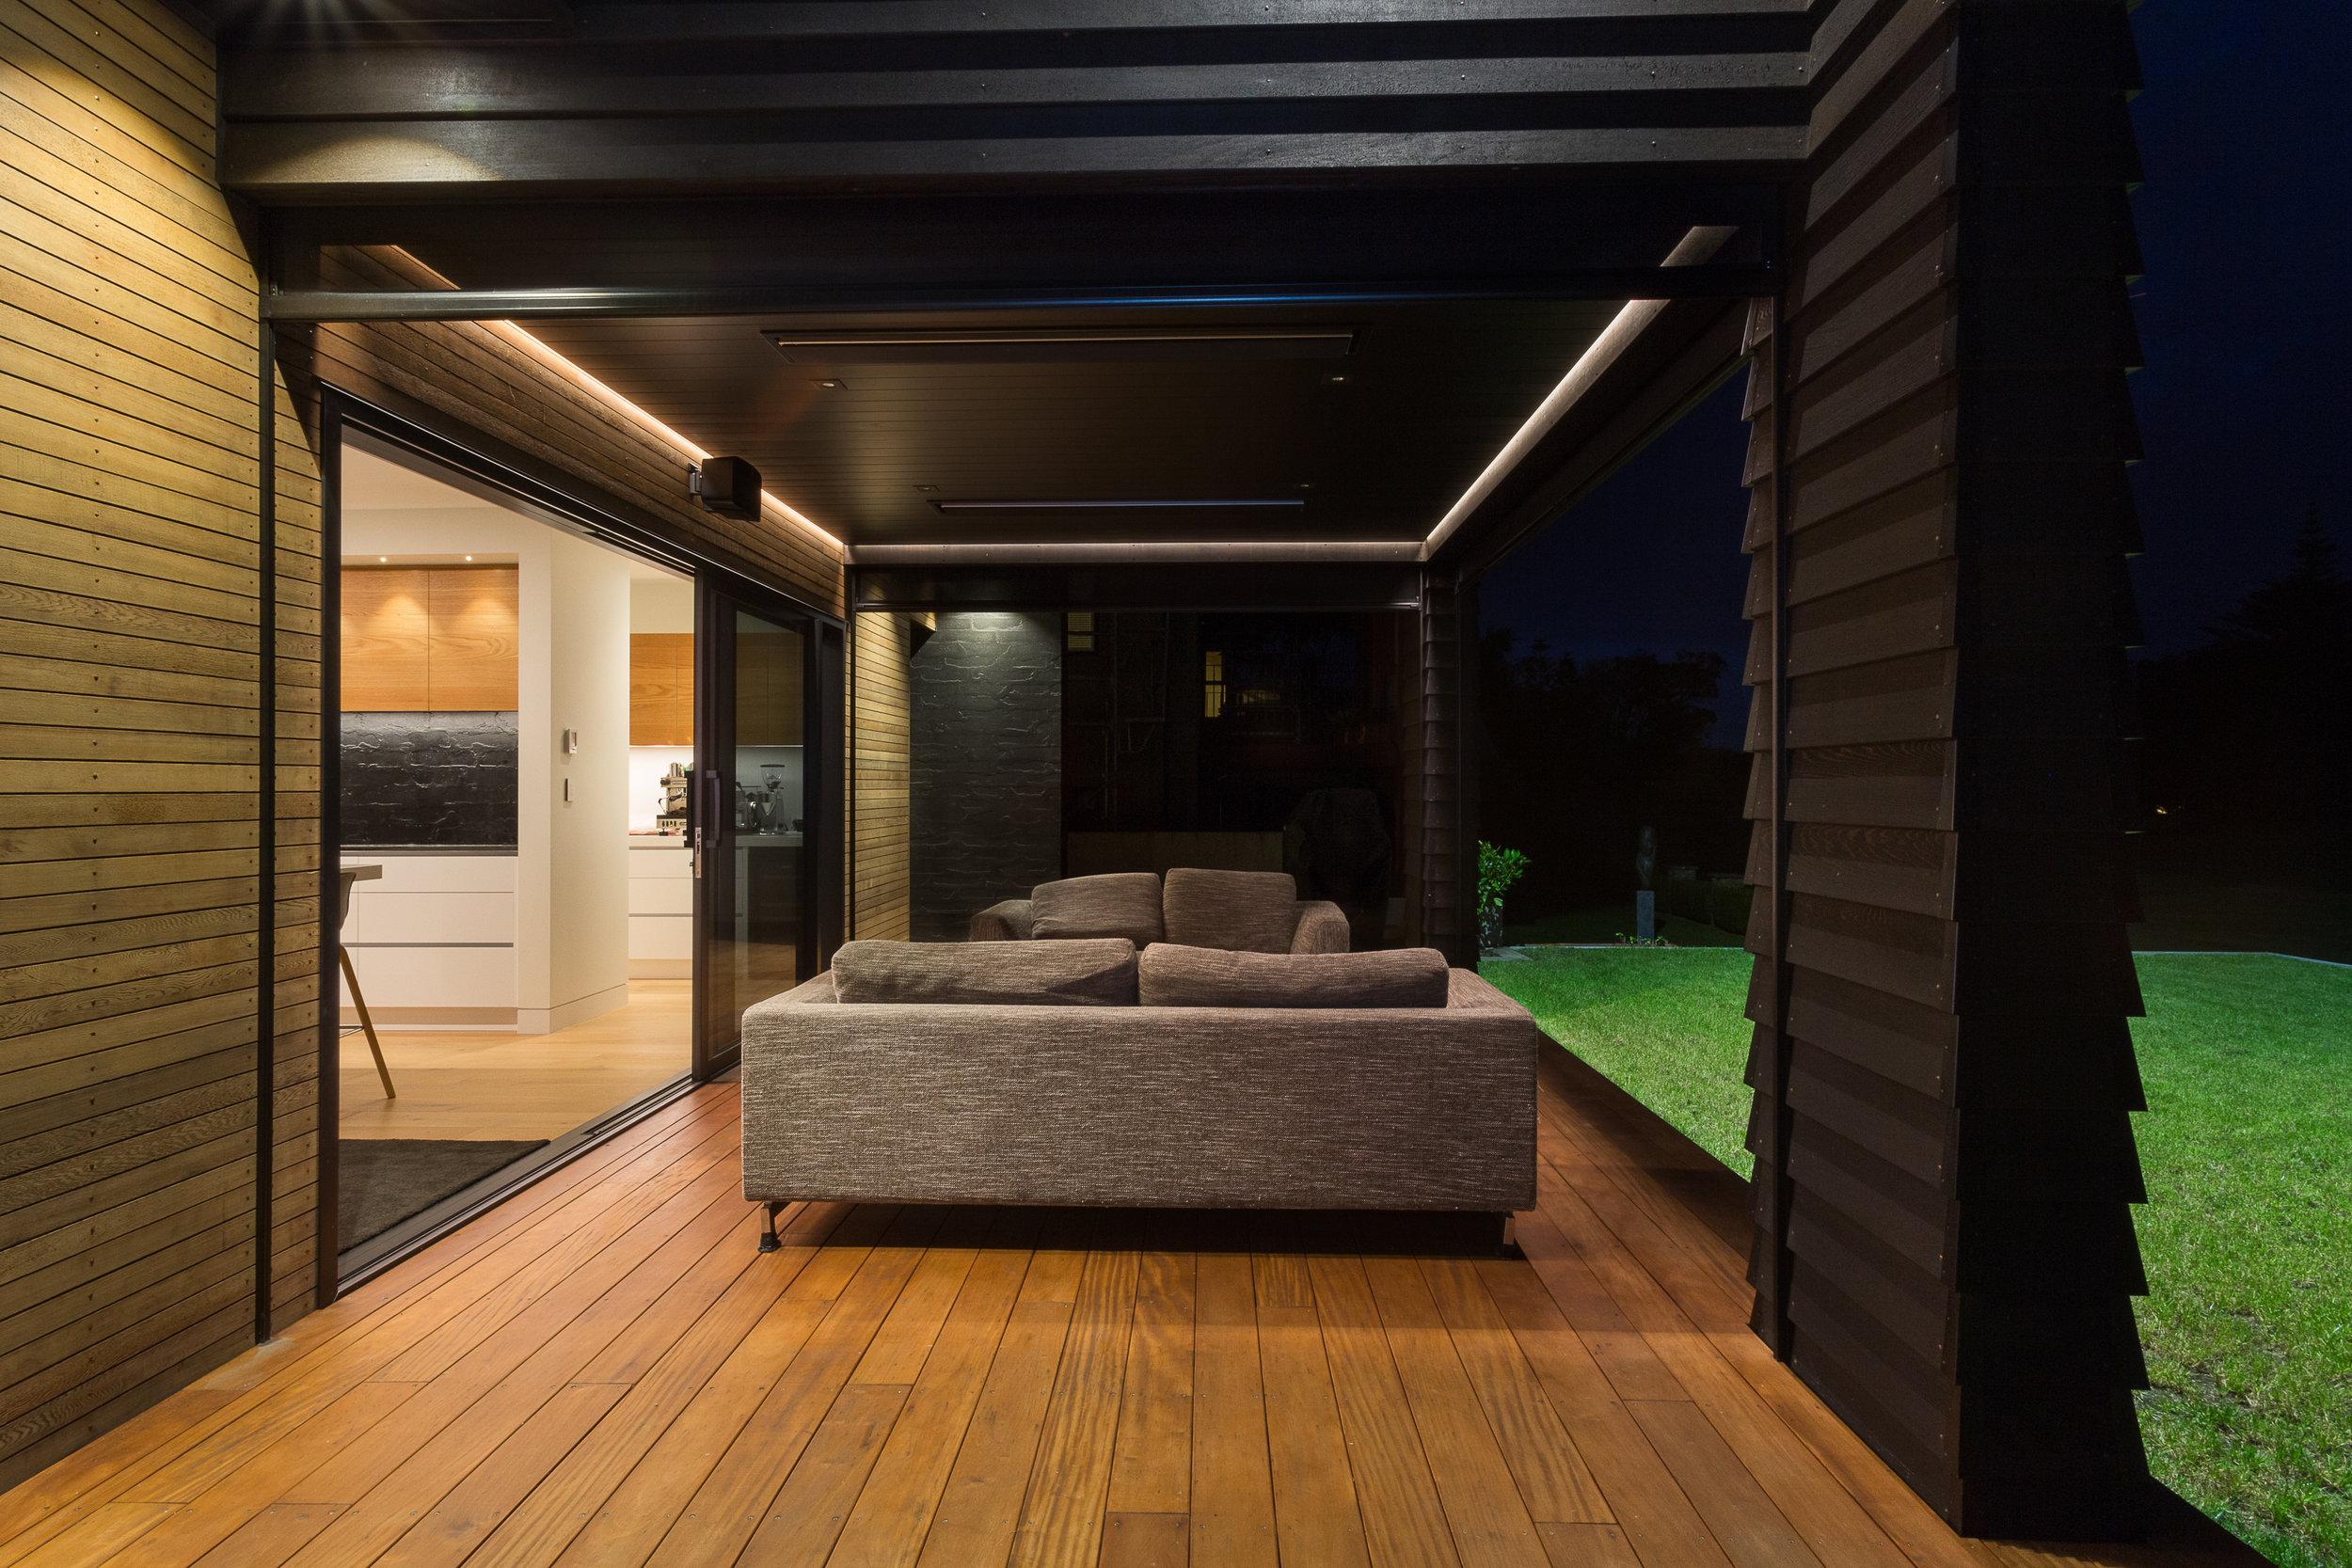 210 Outdoor room KN.jpg